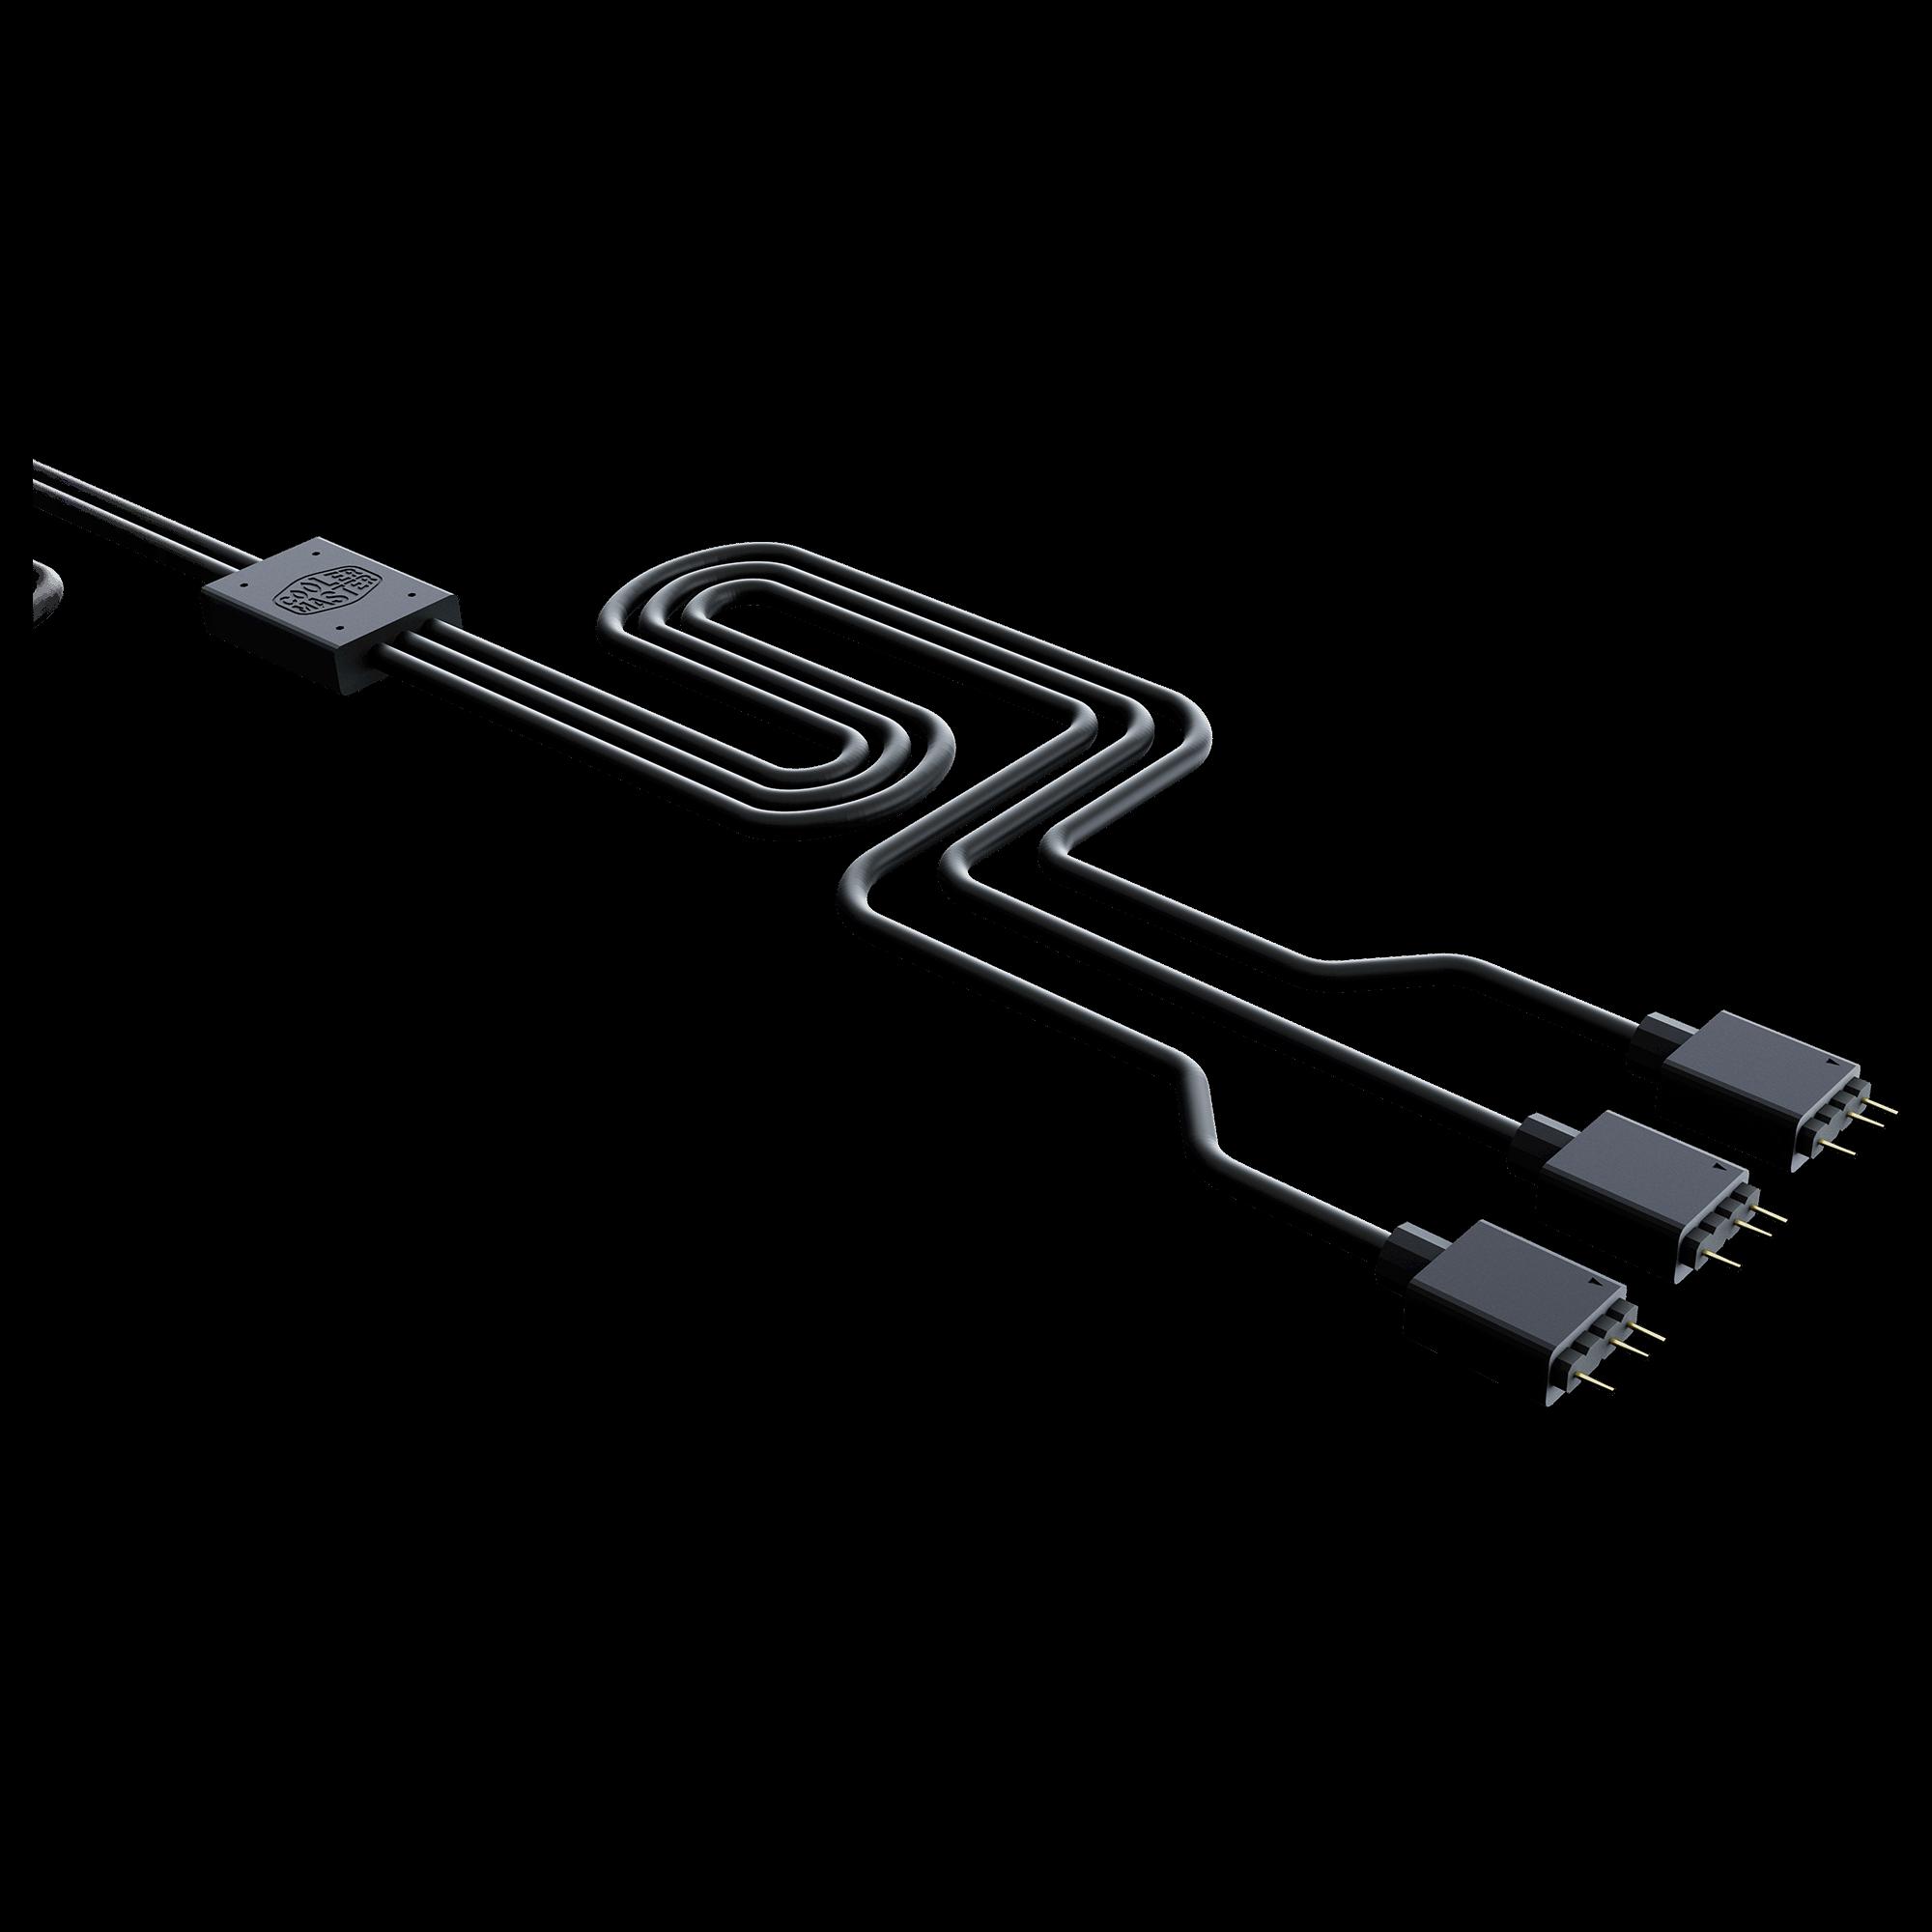 Cabo Divisor Endereçável Cooler Master 1 para 3 Fans - MFX-AWHN-3NNN1-R1